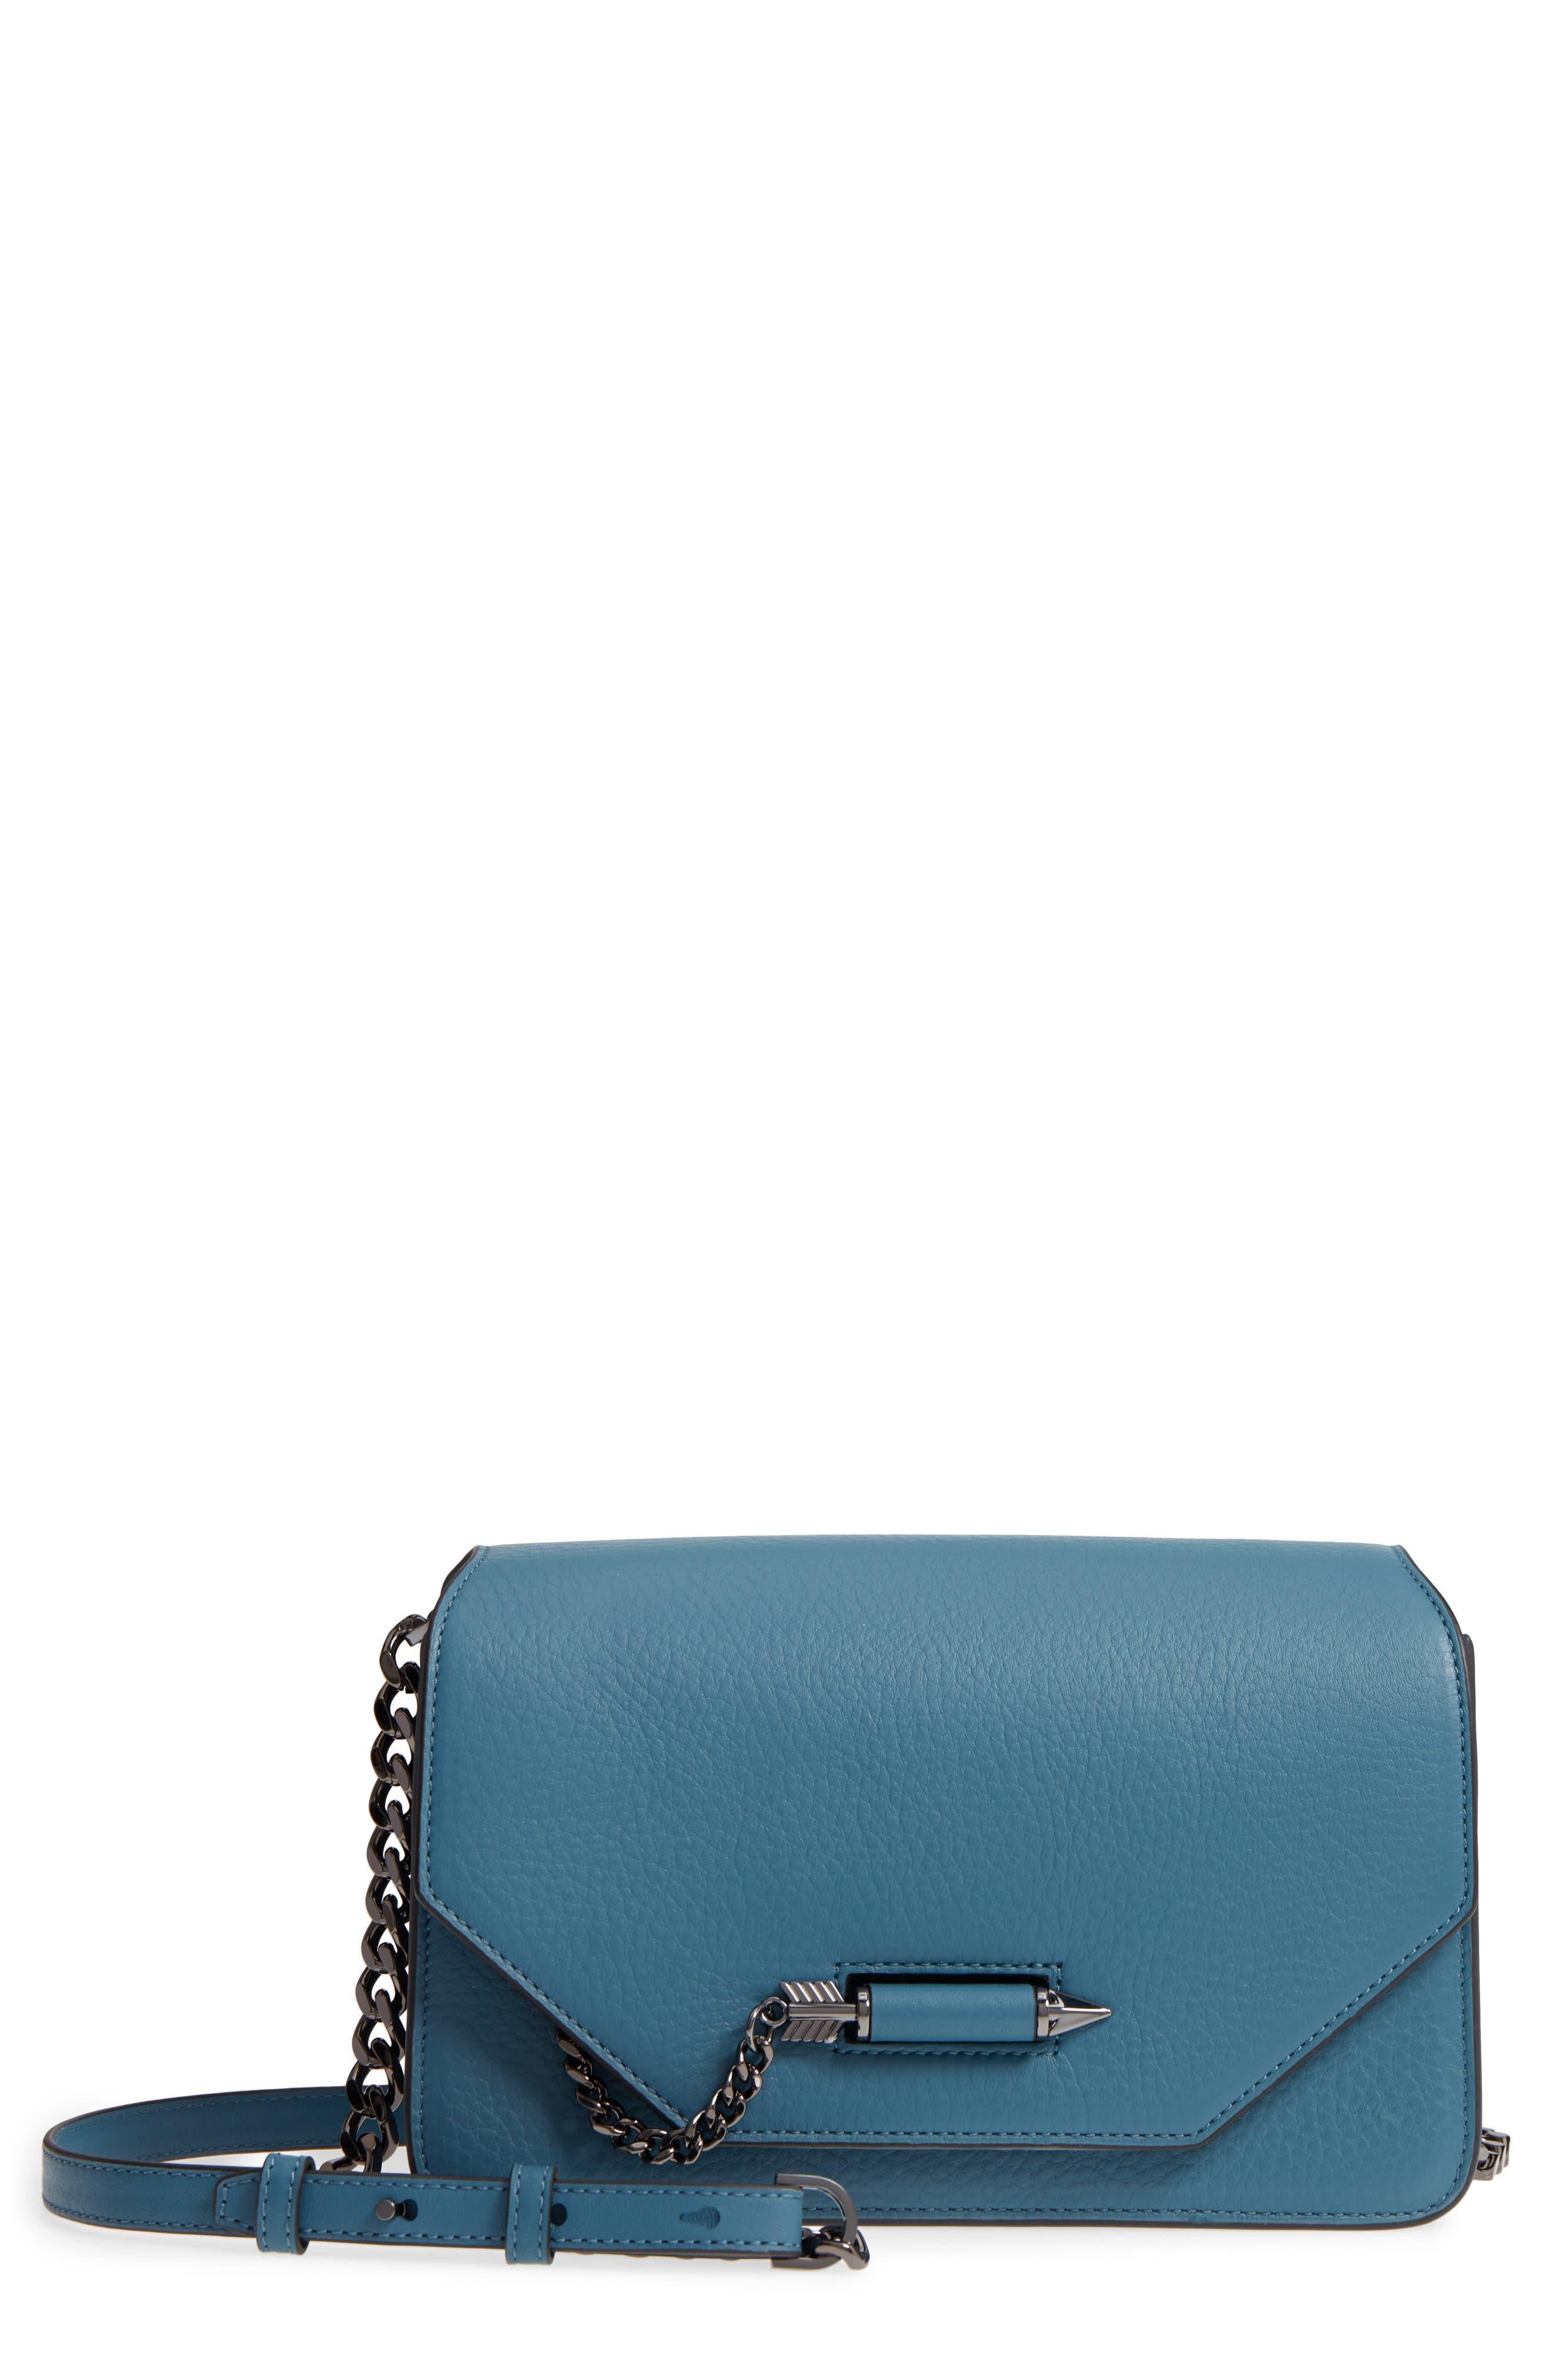 Cortney Nappa Leather Shoulder/Crossbody Bag,                             Main thumbnail 3, color,